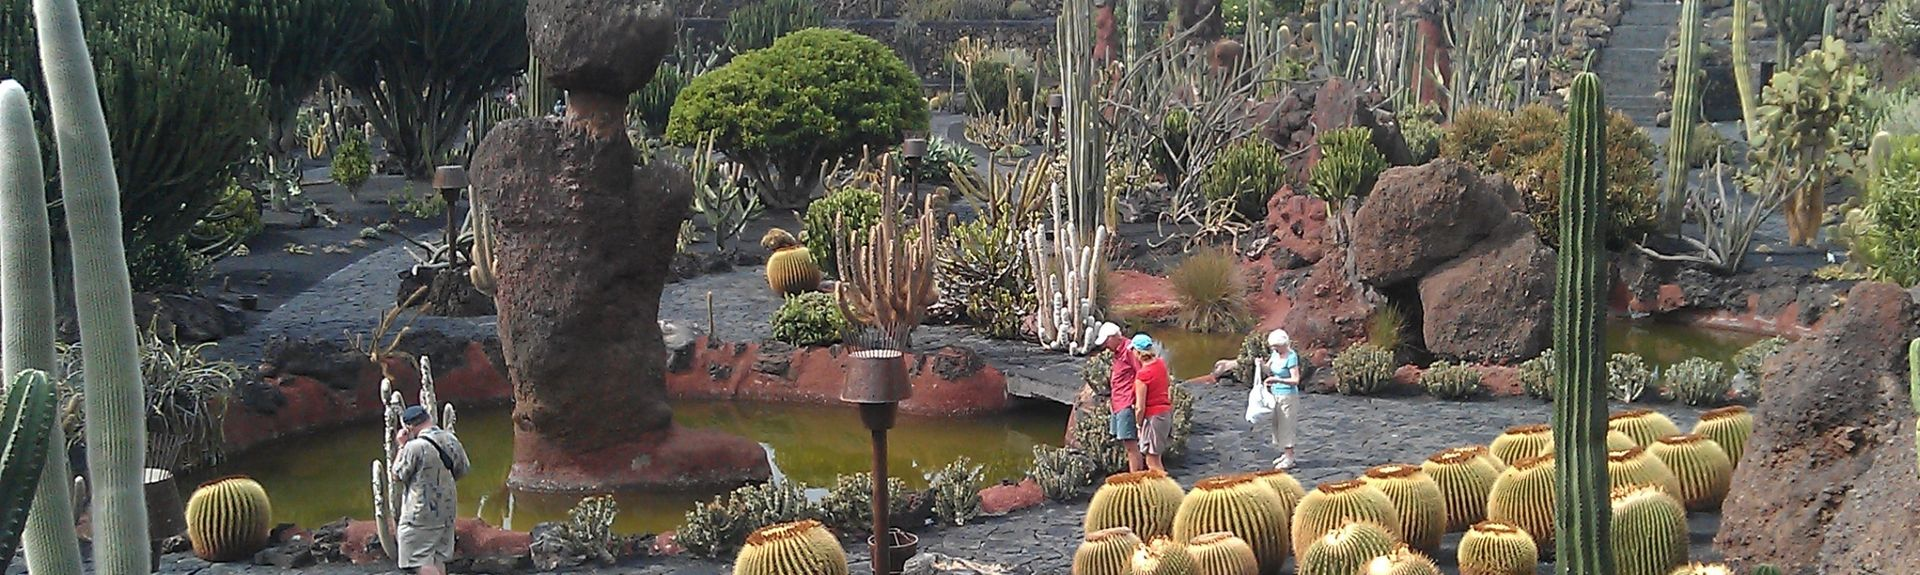 La Asomada, Canary Islands, Spain